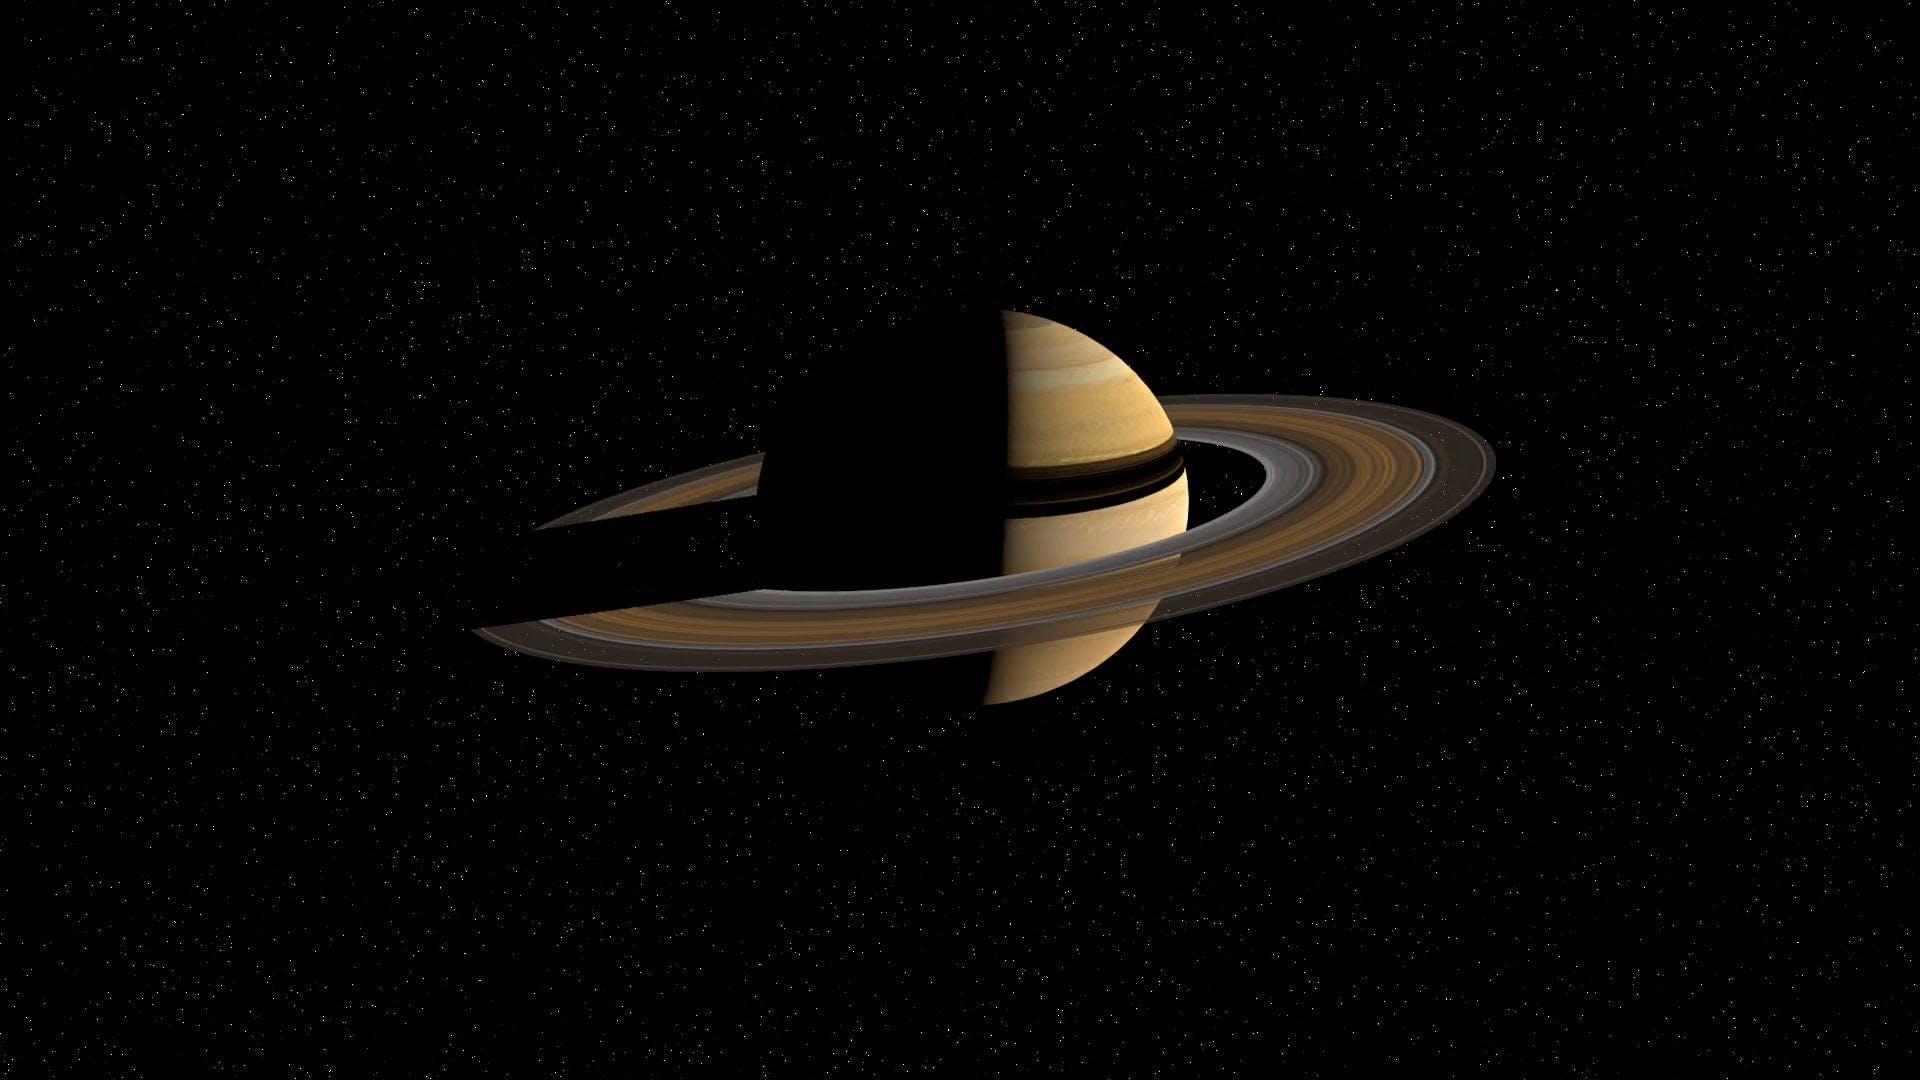 Saturn Rotating